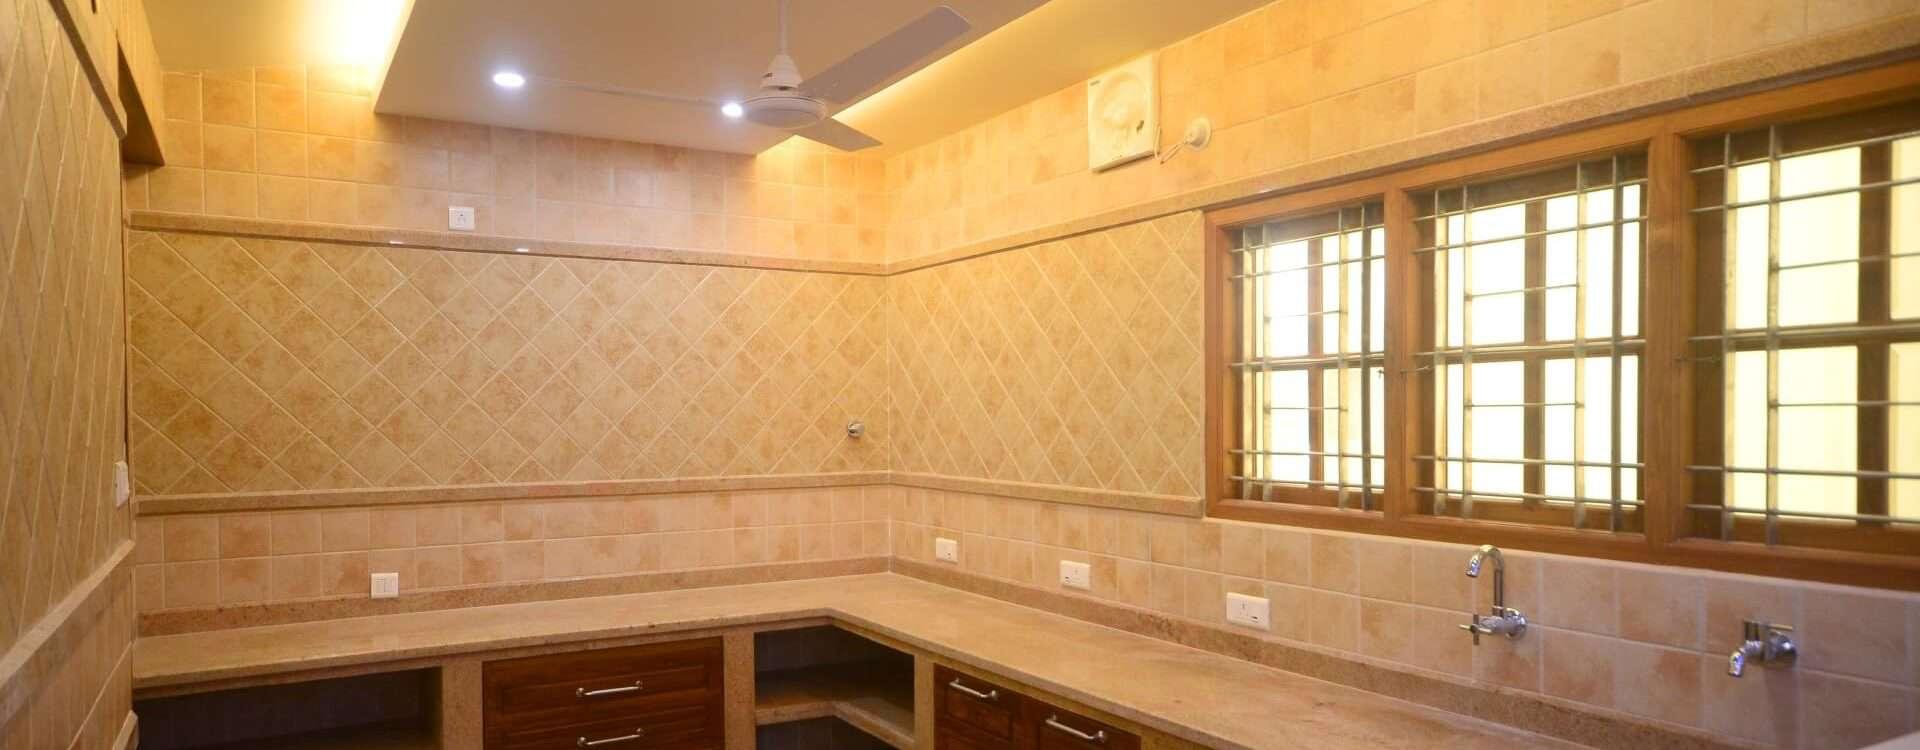 Mr. Rajendra Alva's Residence at Ivory Towers Apartment Attavar, Mangalore